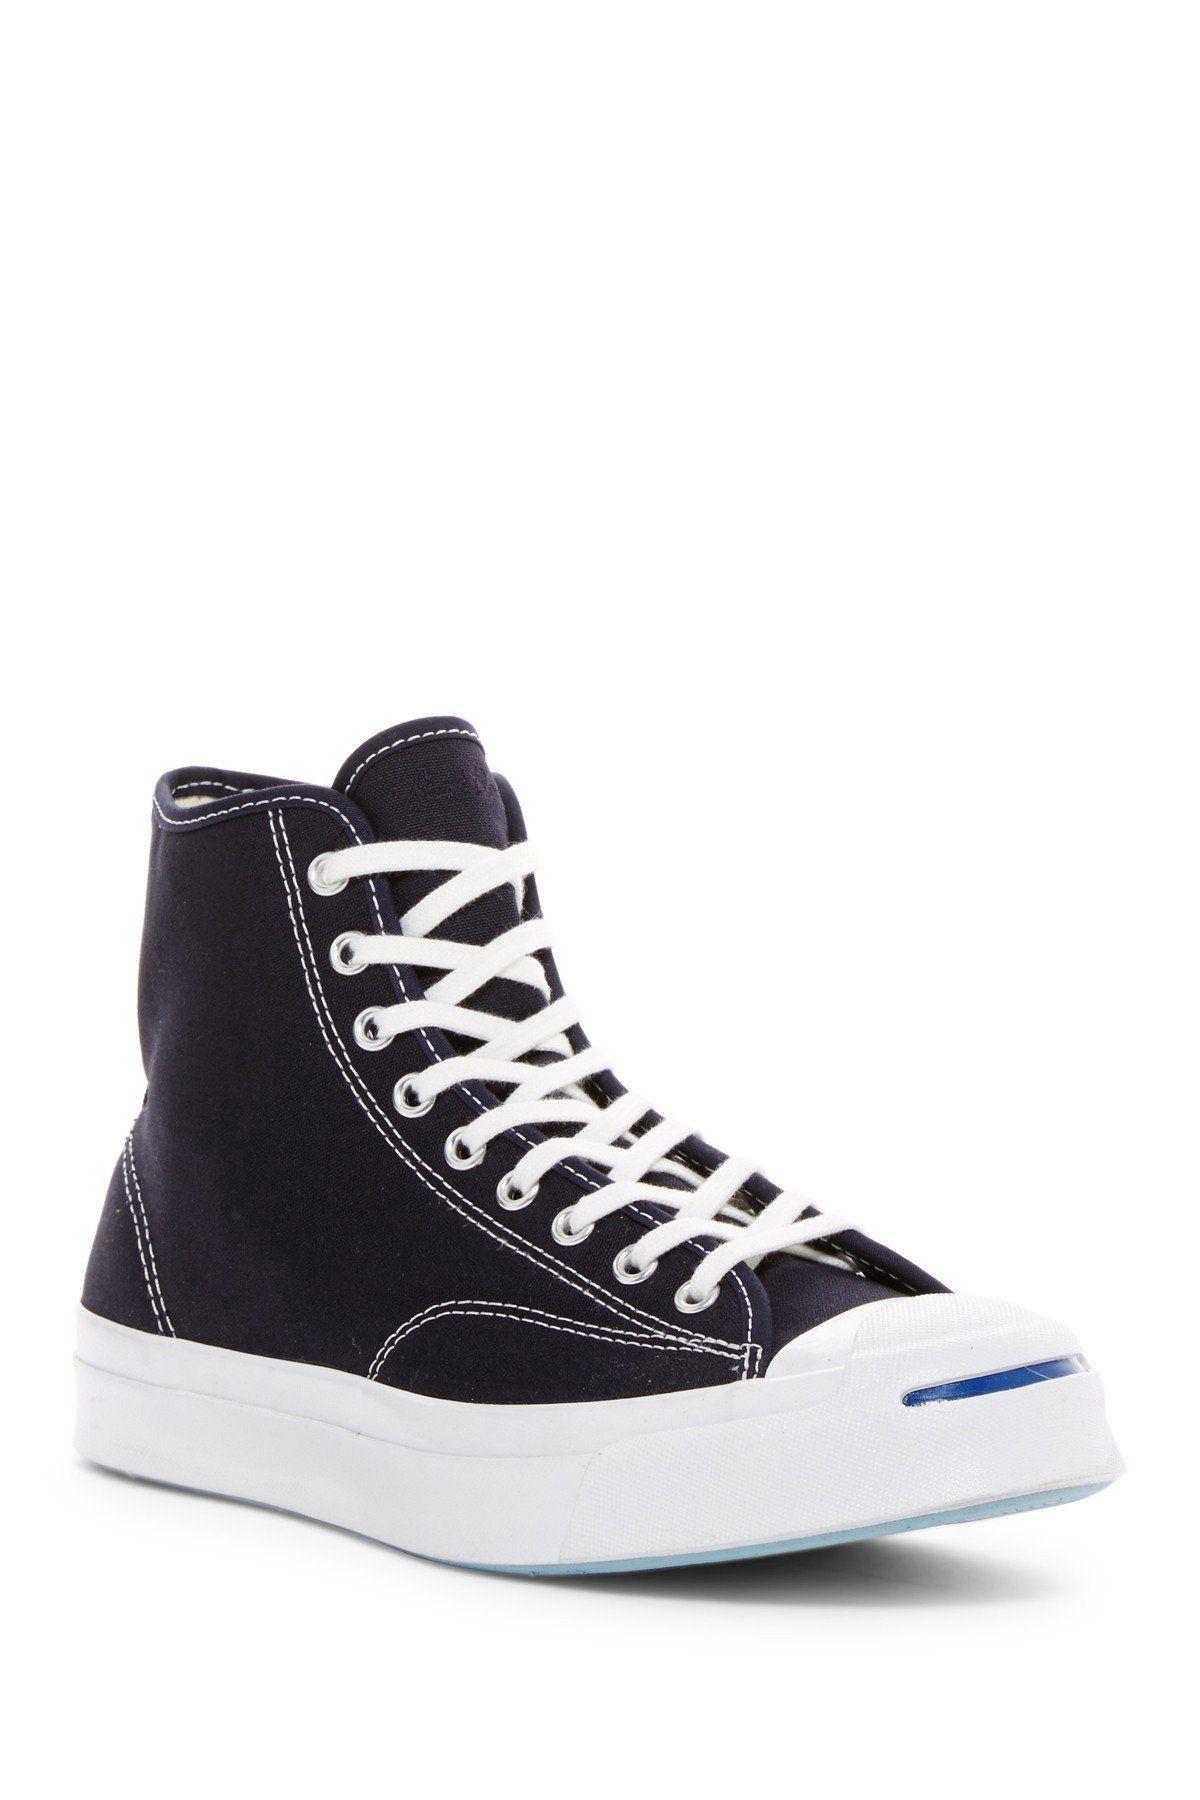 8fb695210aba73 Jack Purcell Signature Hi-Top Sneaker (Unisex)